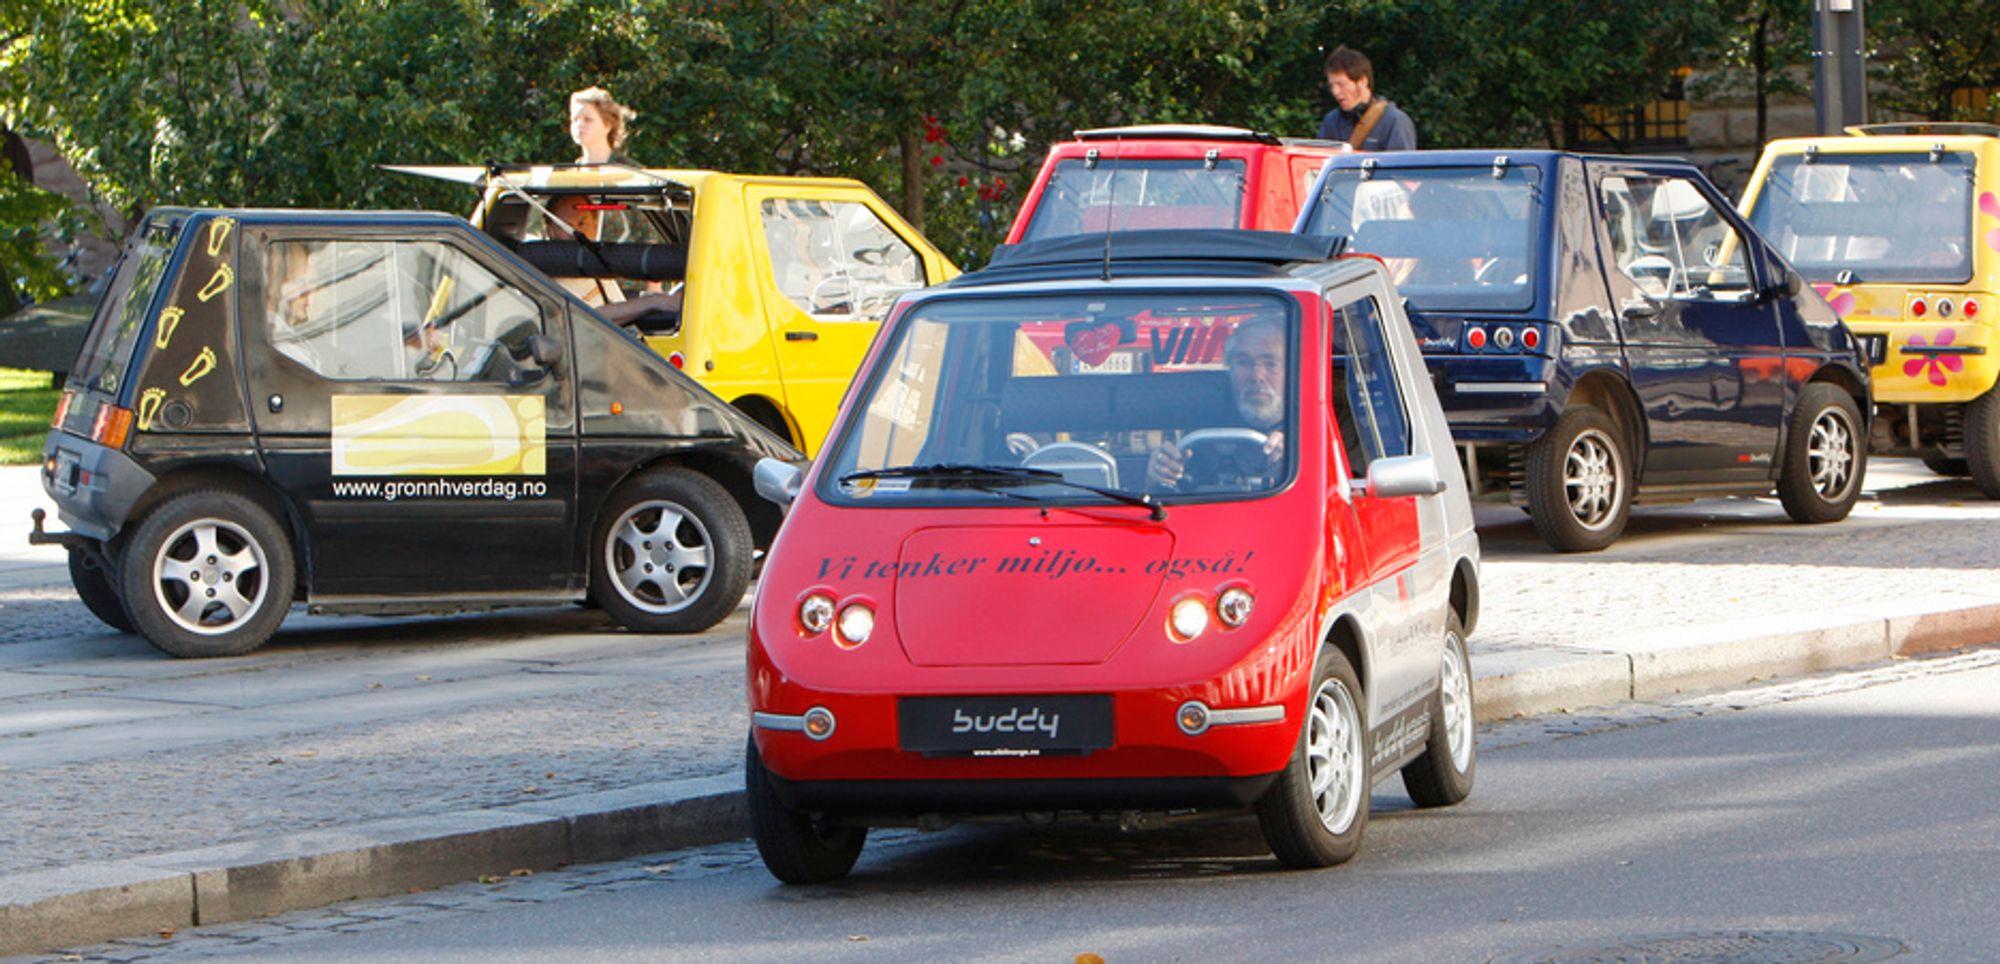 Gratis parkeringsplasser for elbiler må utredes nærmere, mener Norges Parkeringsforening.